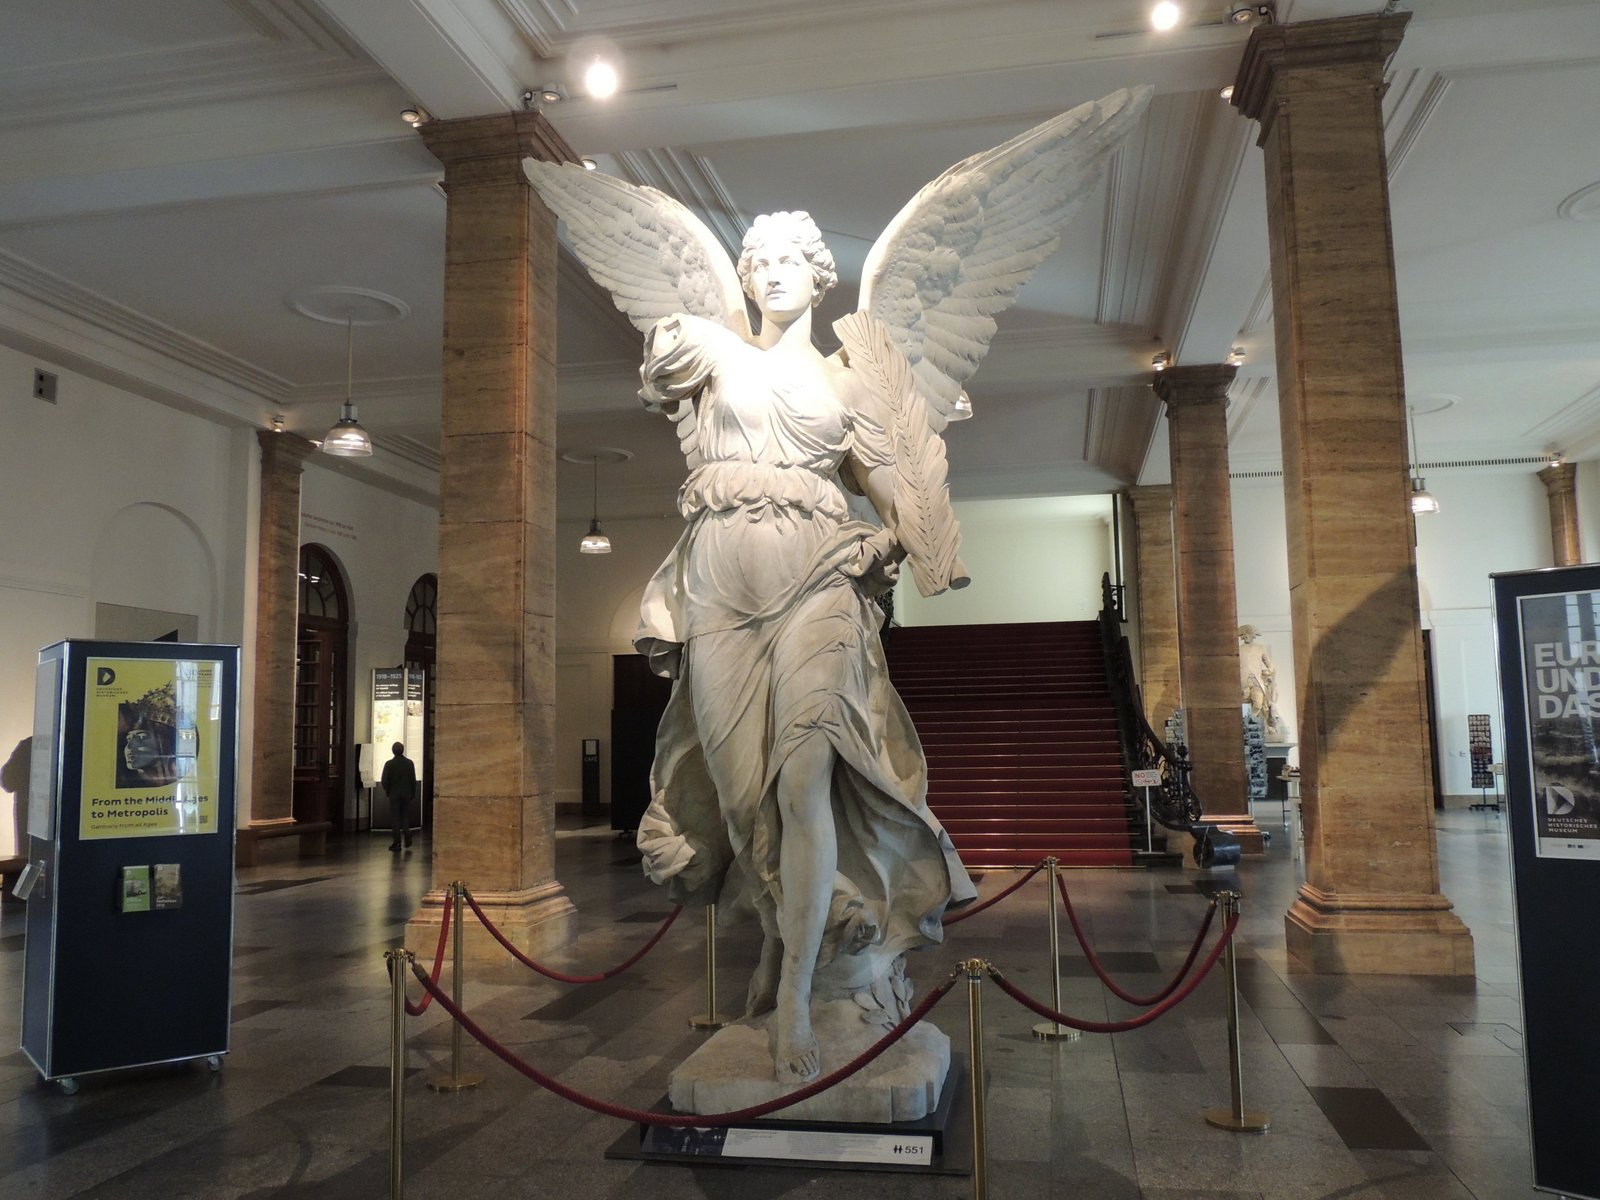 Das Deutsche Historische Museum Berlin